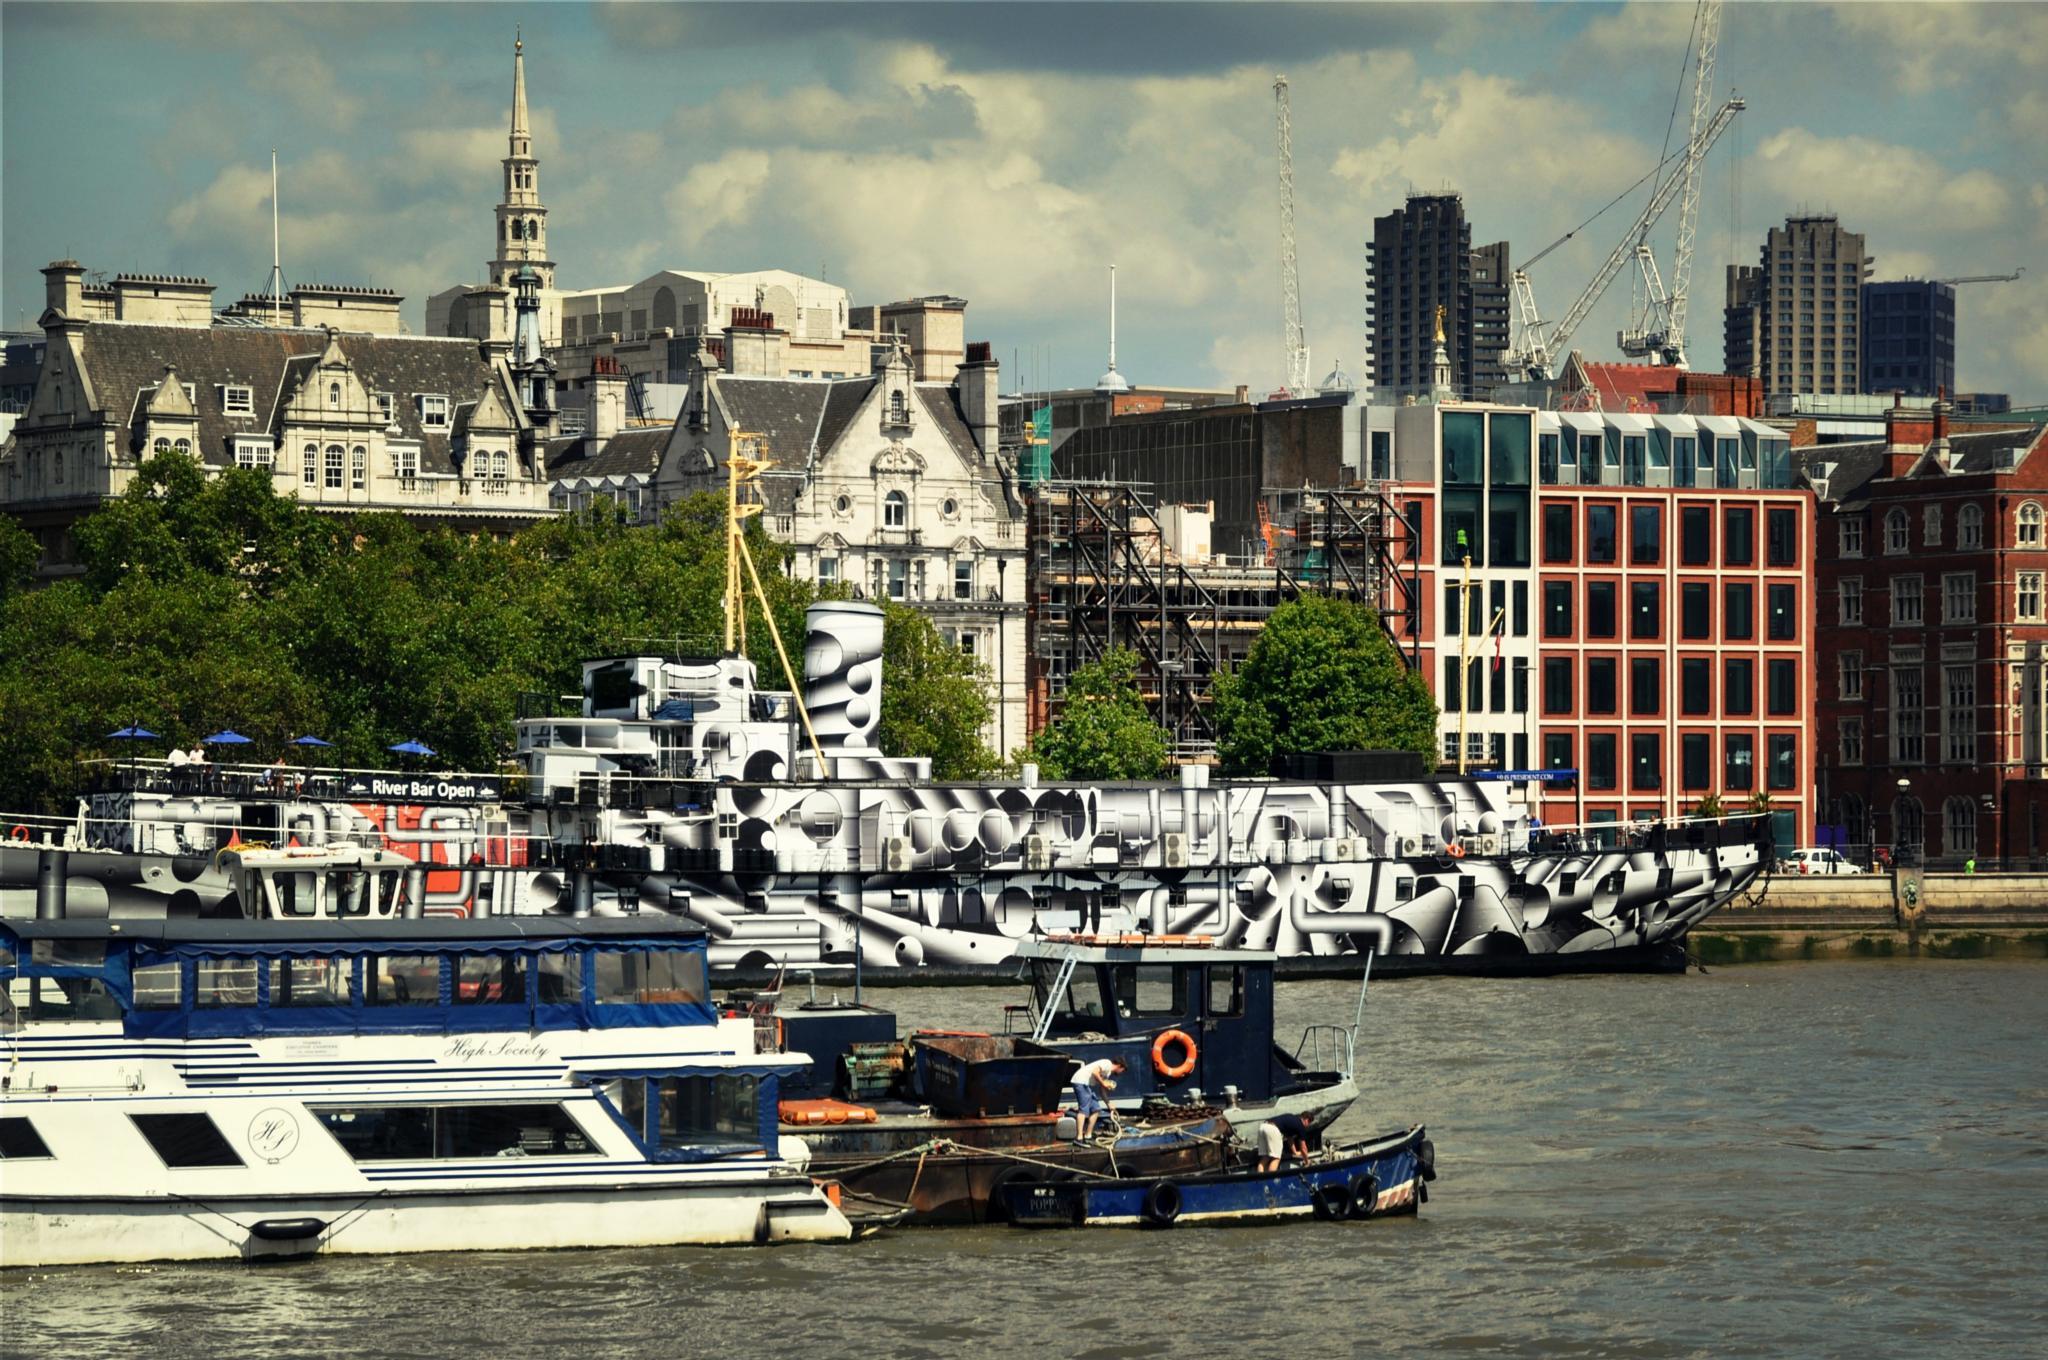 London views by ermannoalbano